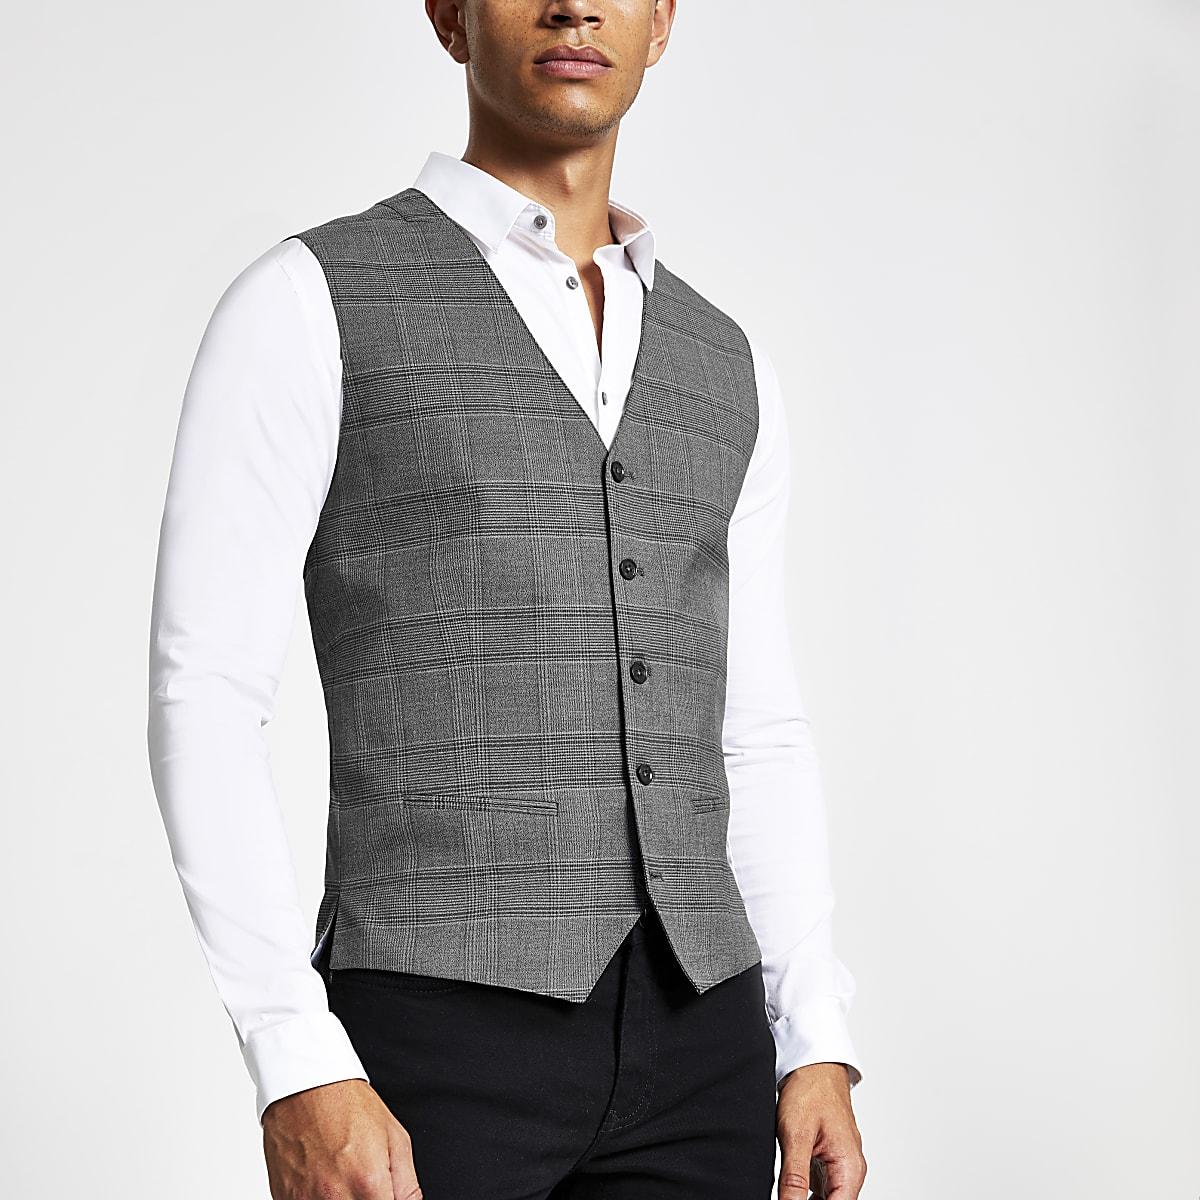 Jack and Jones grey check vest